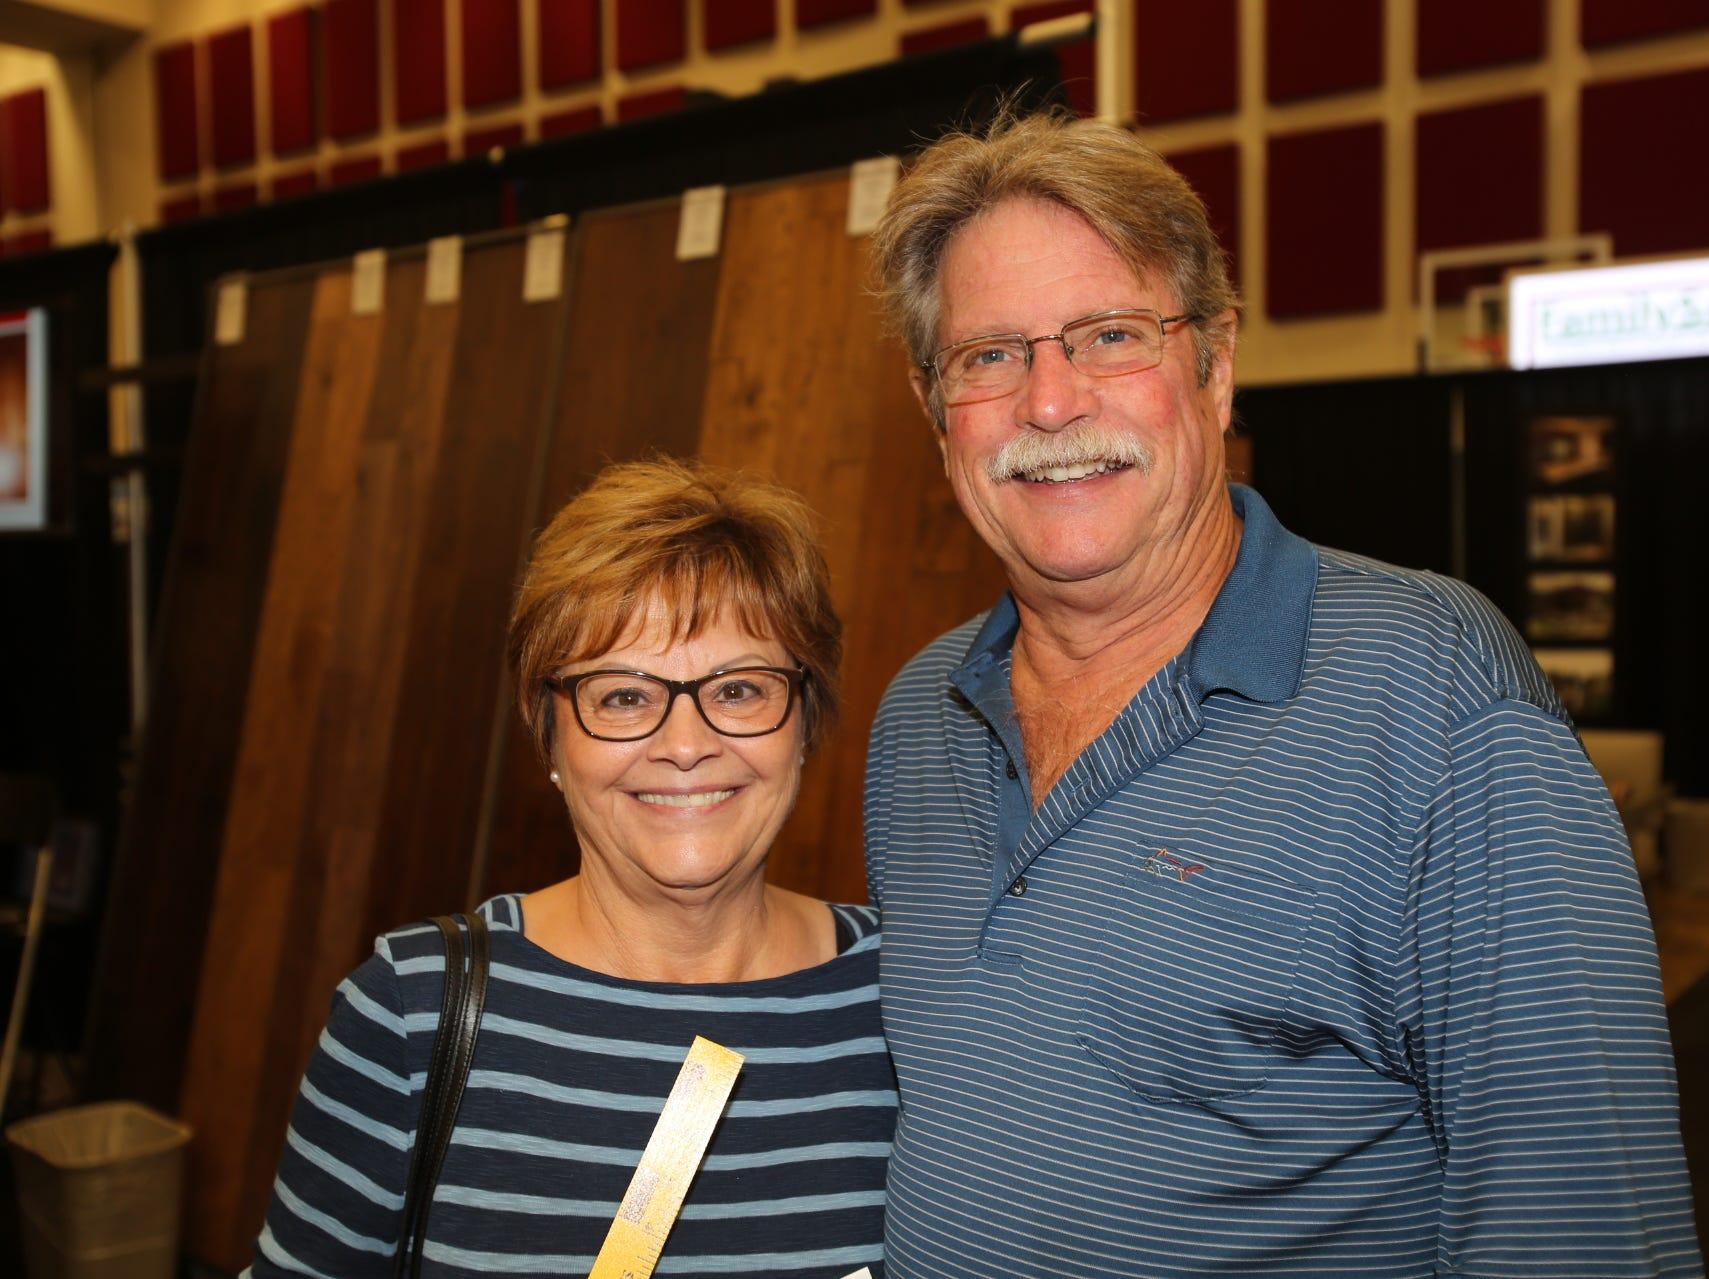 Glenda and John Bulcock